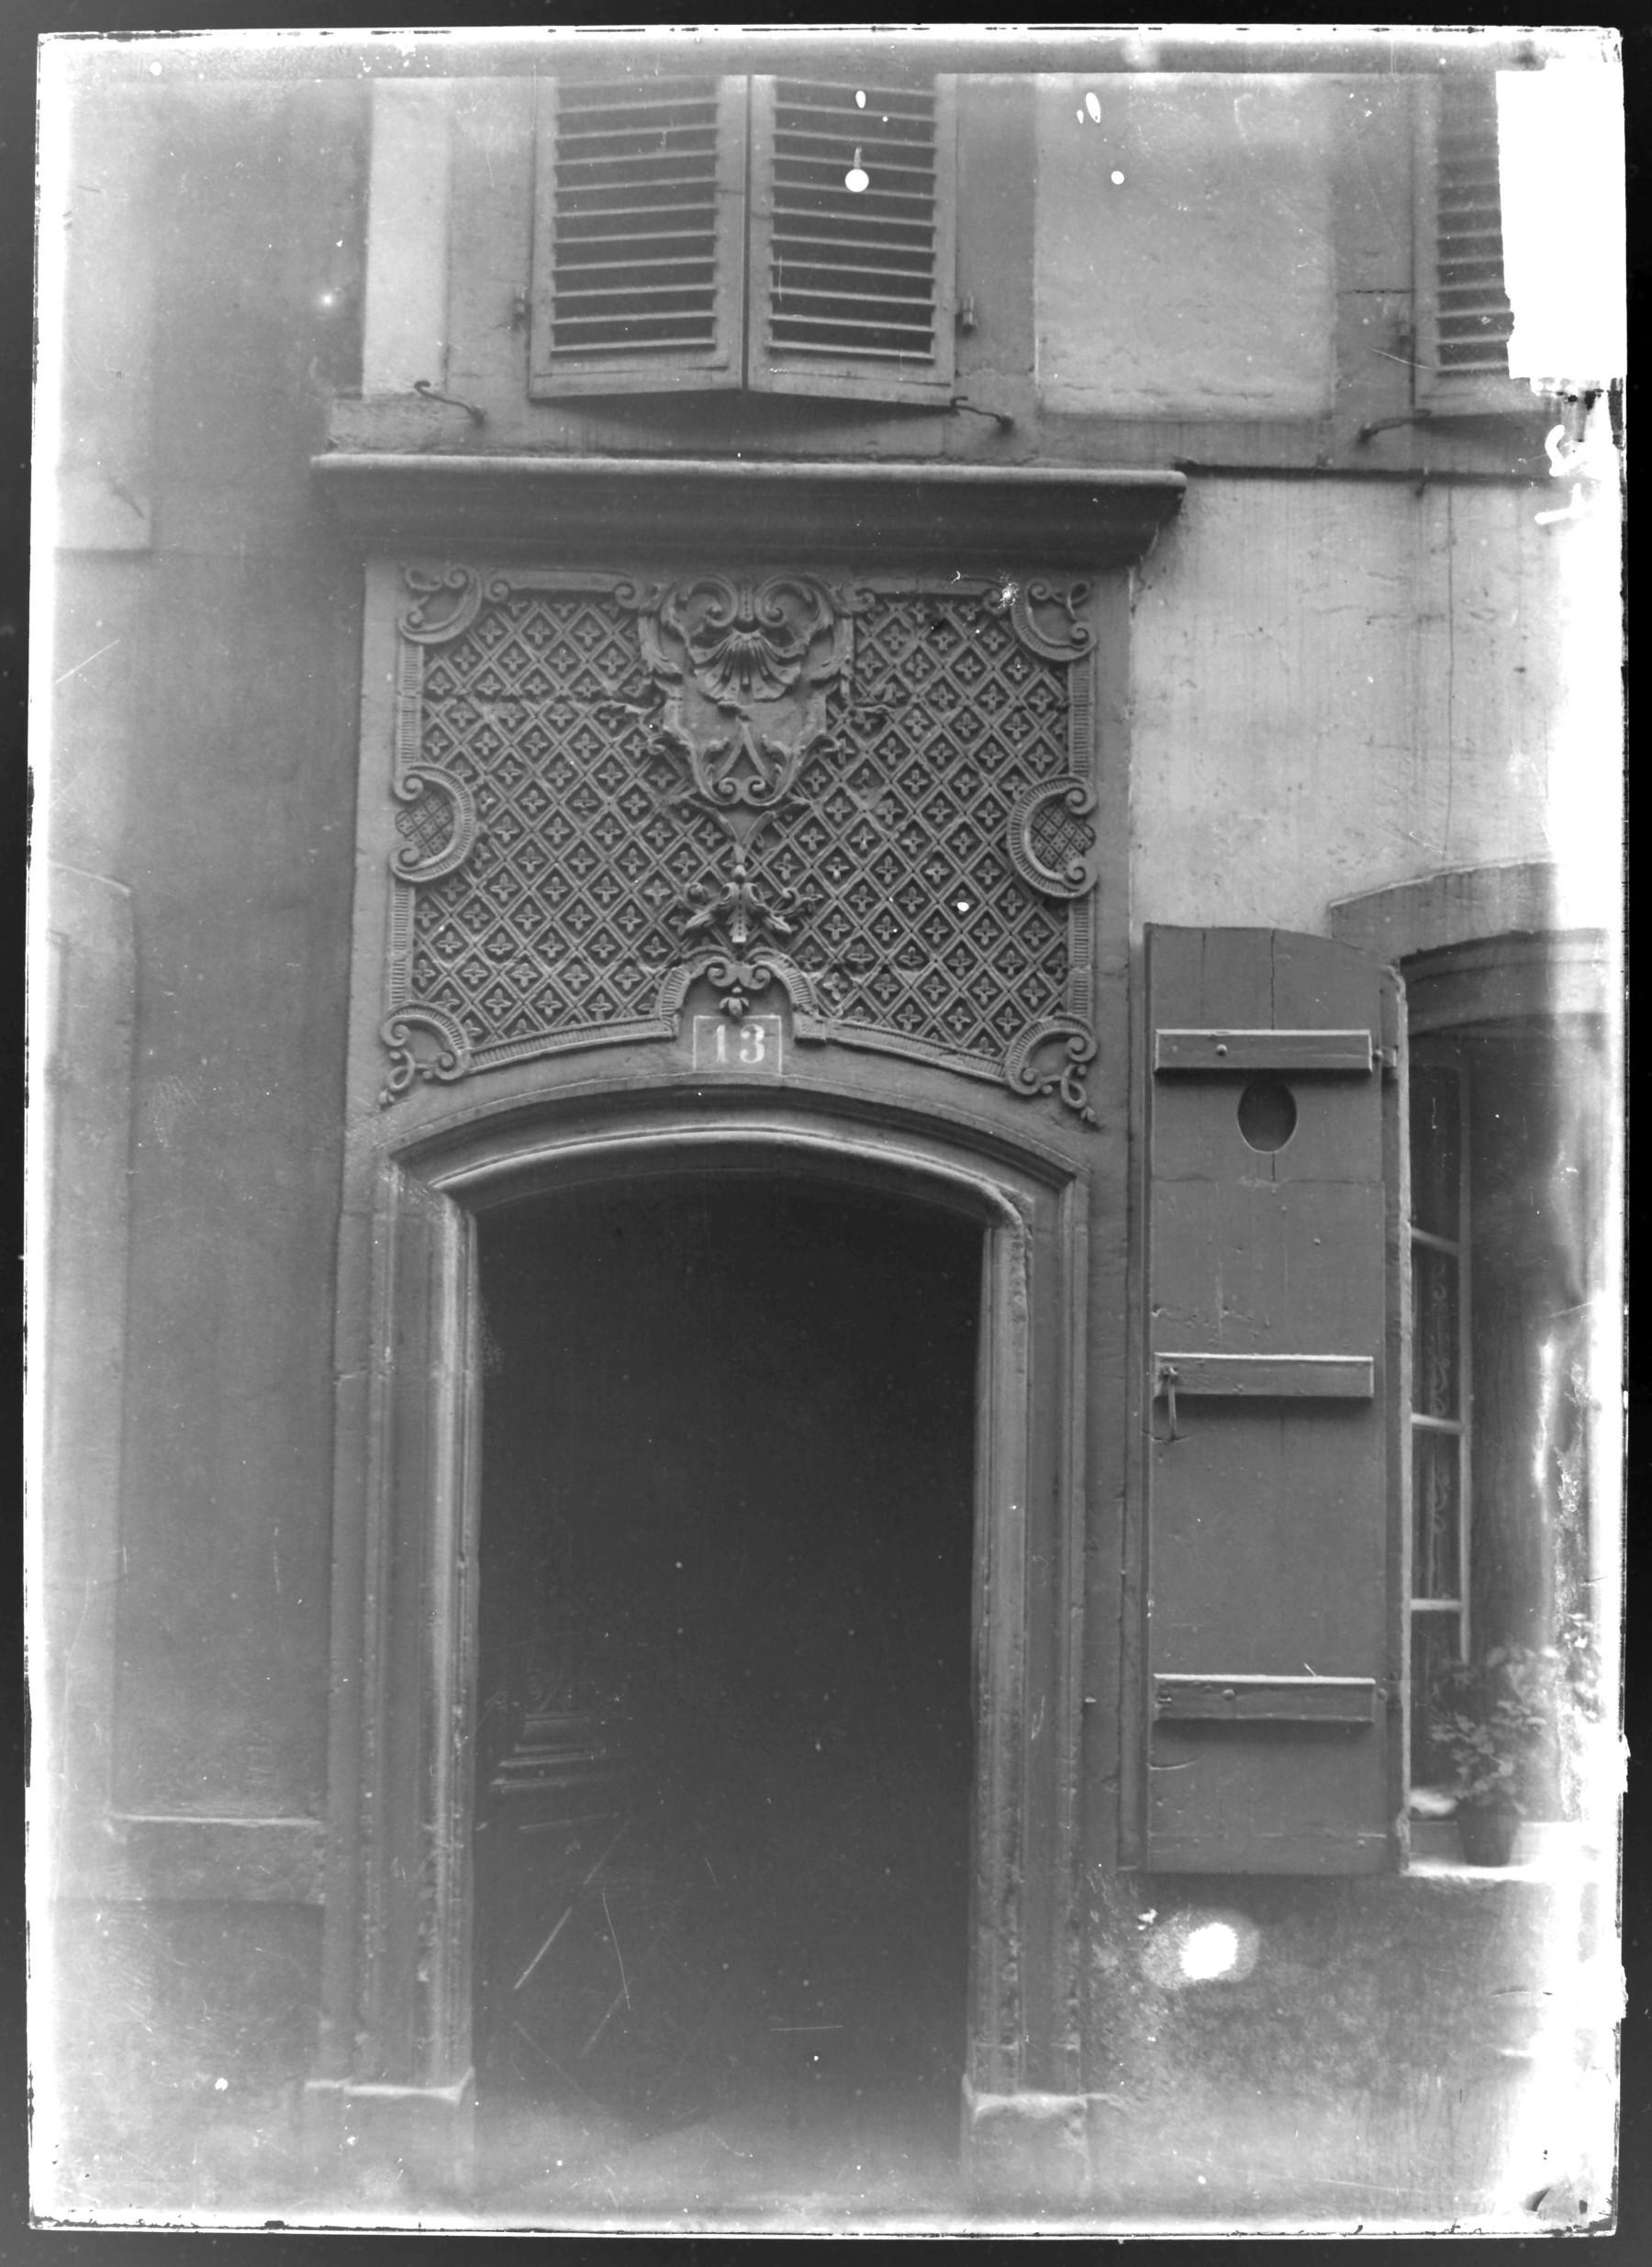 Contenu du Porte d'une rue de Metz